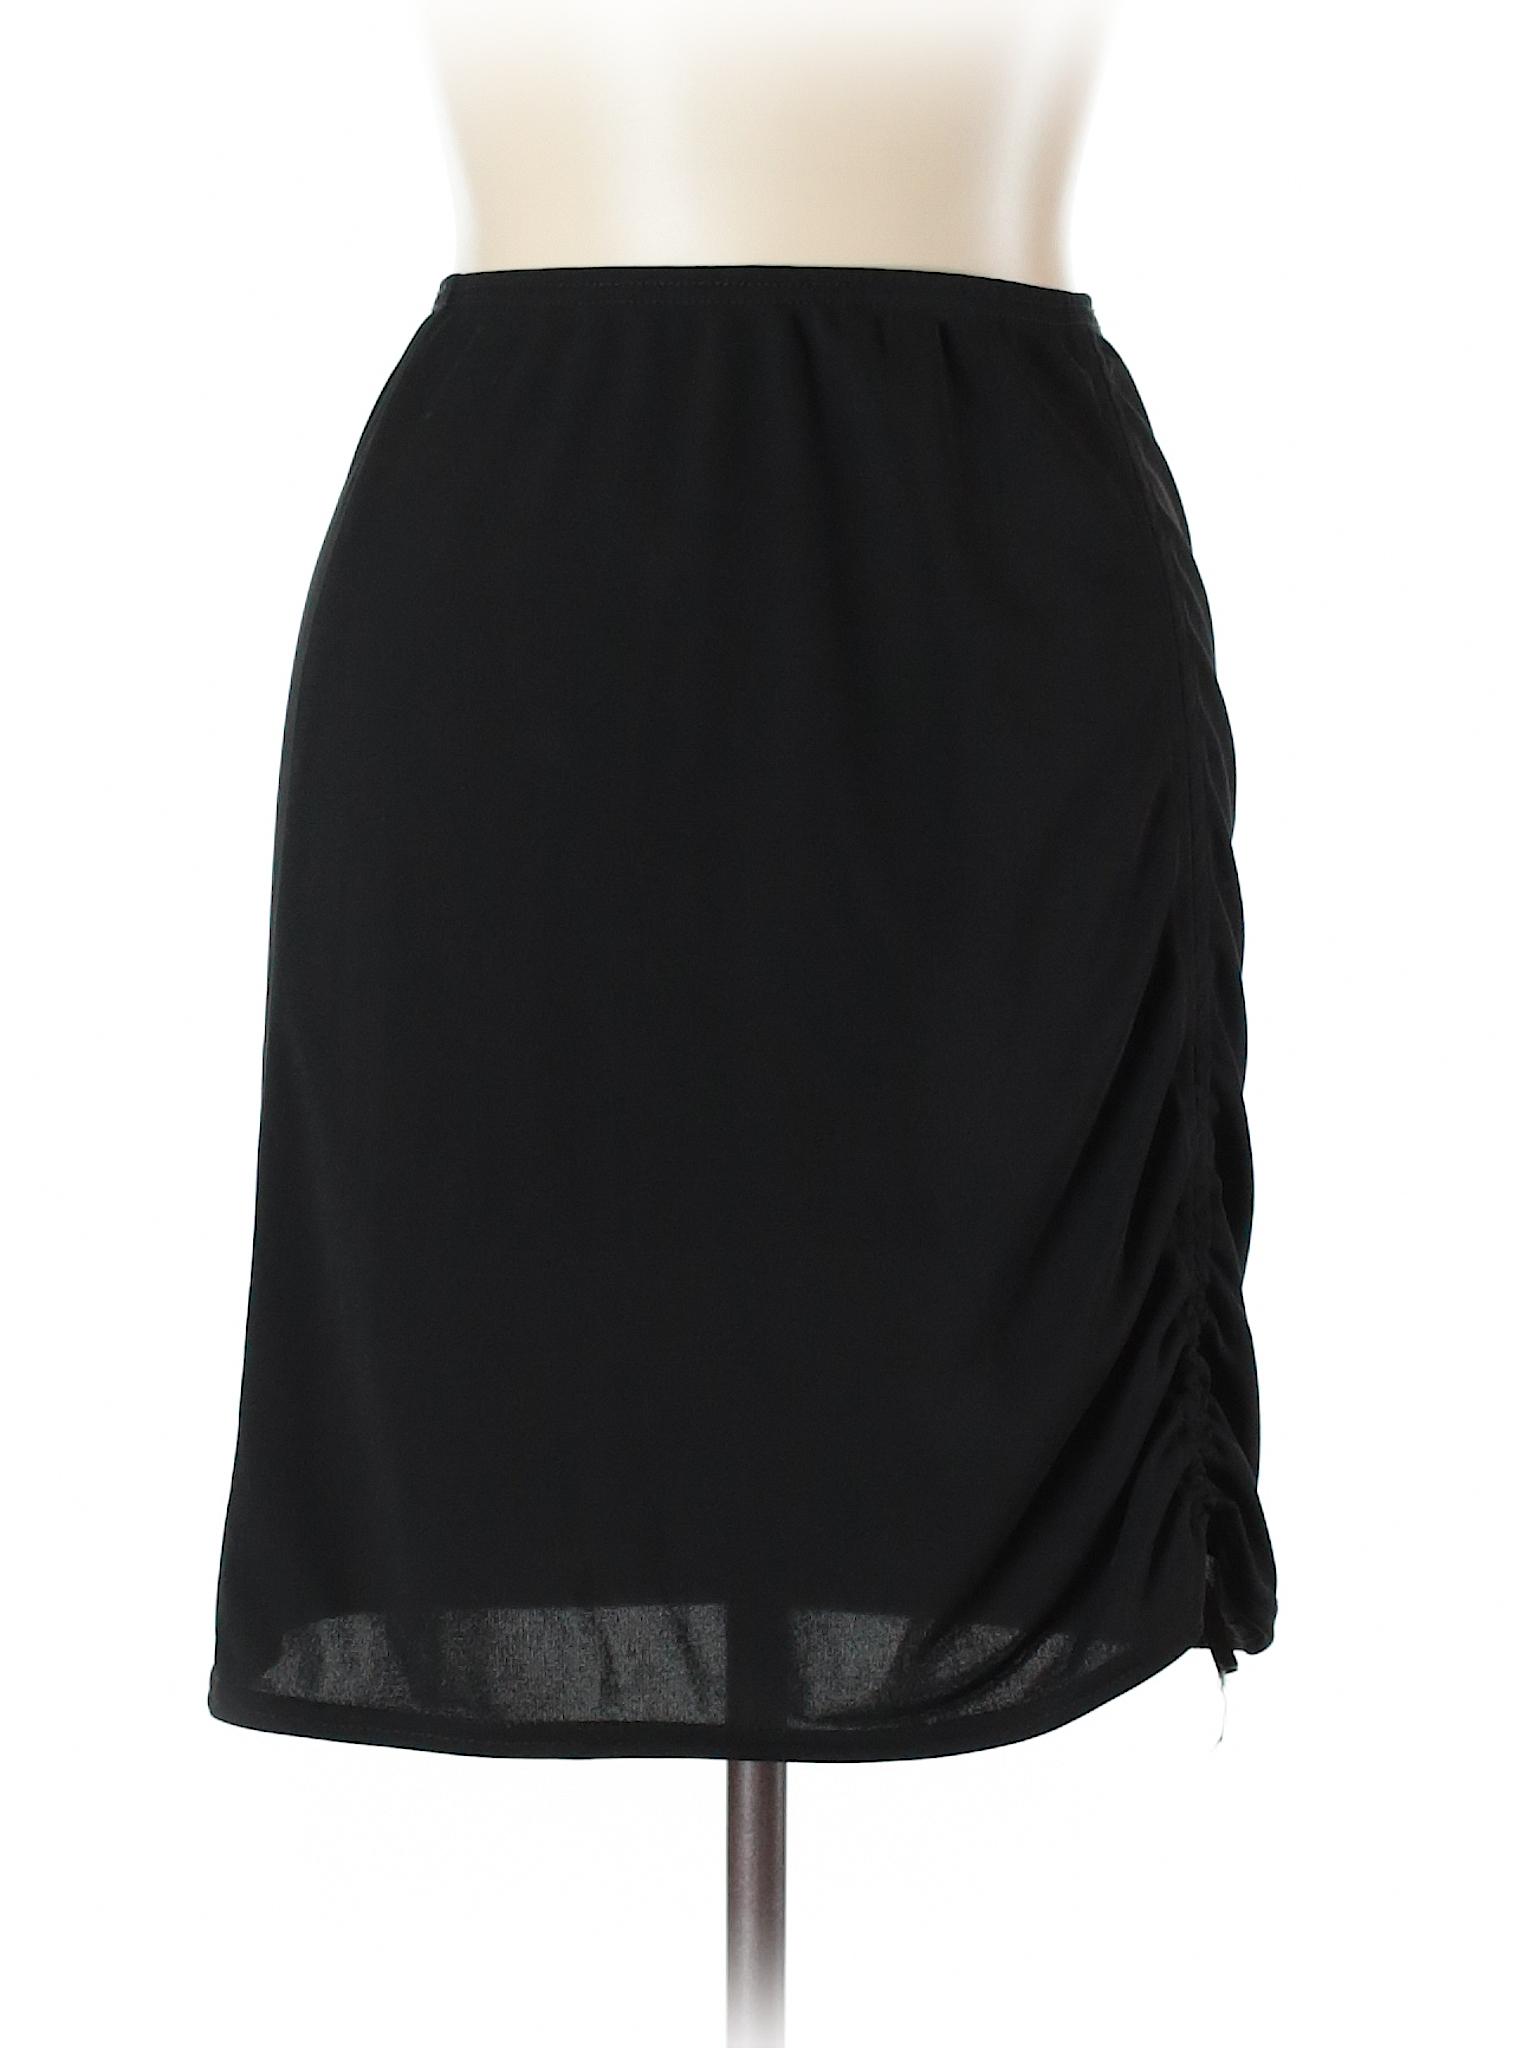 Boutique Boutique Casual Skirt Skirt Skirt Skirt Casual Boutique Casual Casual Boutique Uf5w8H